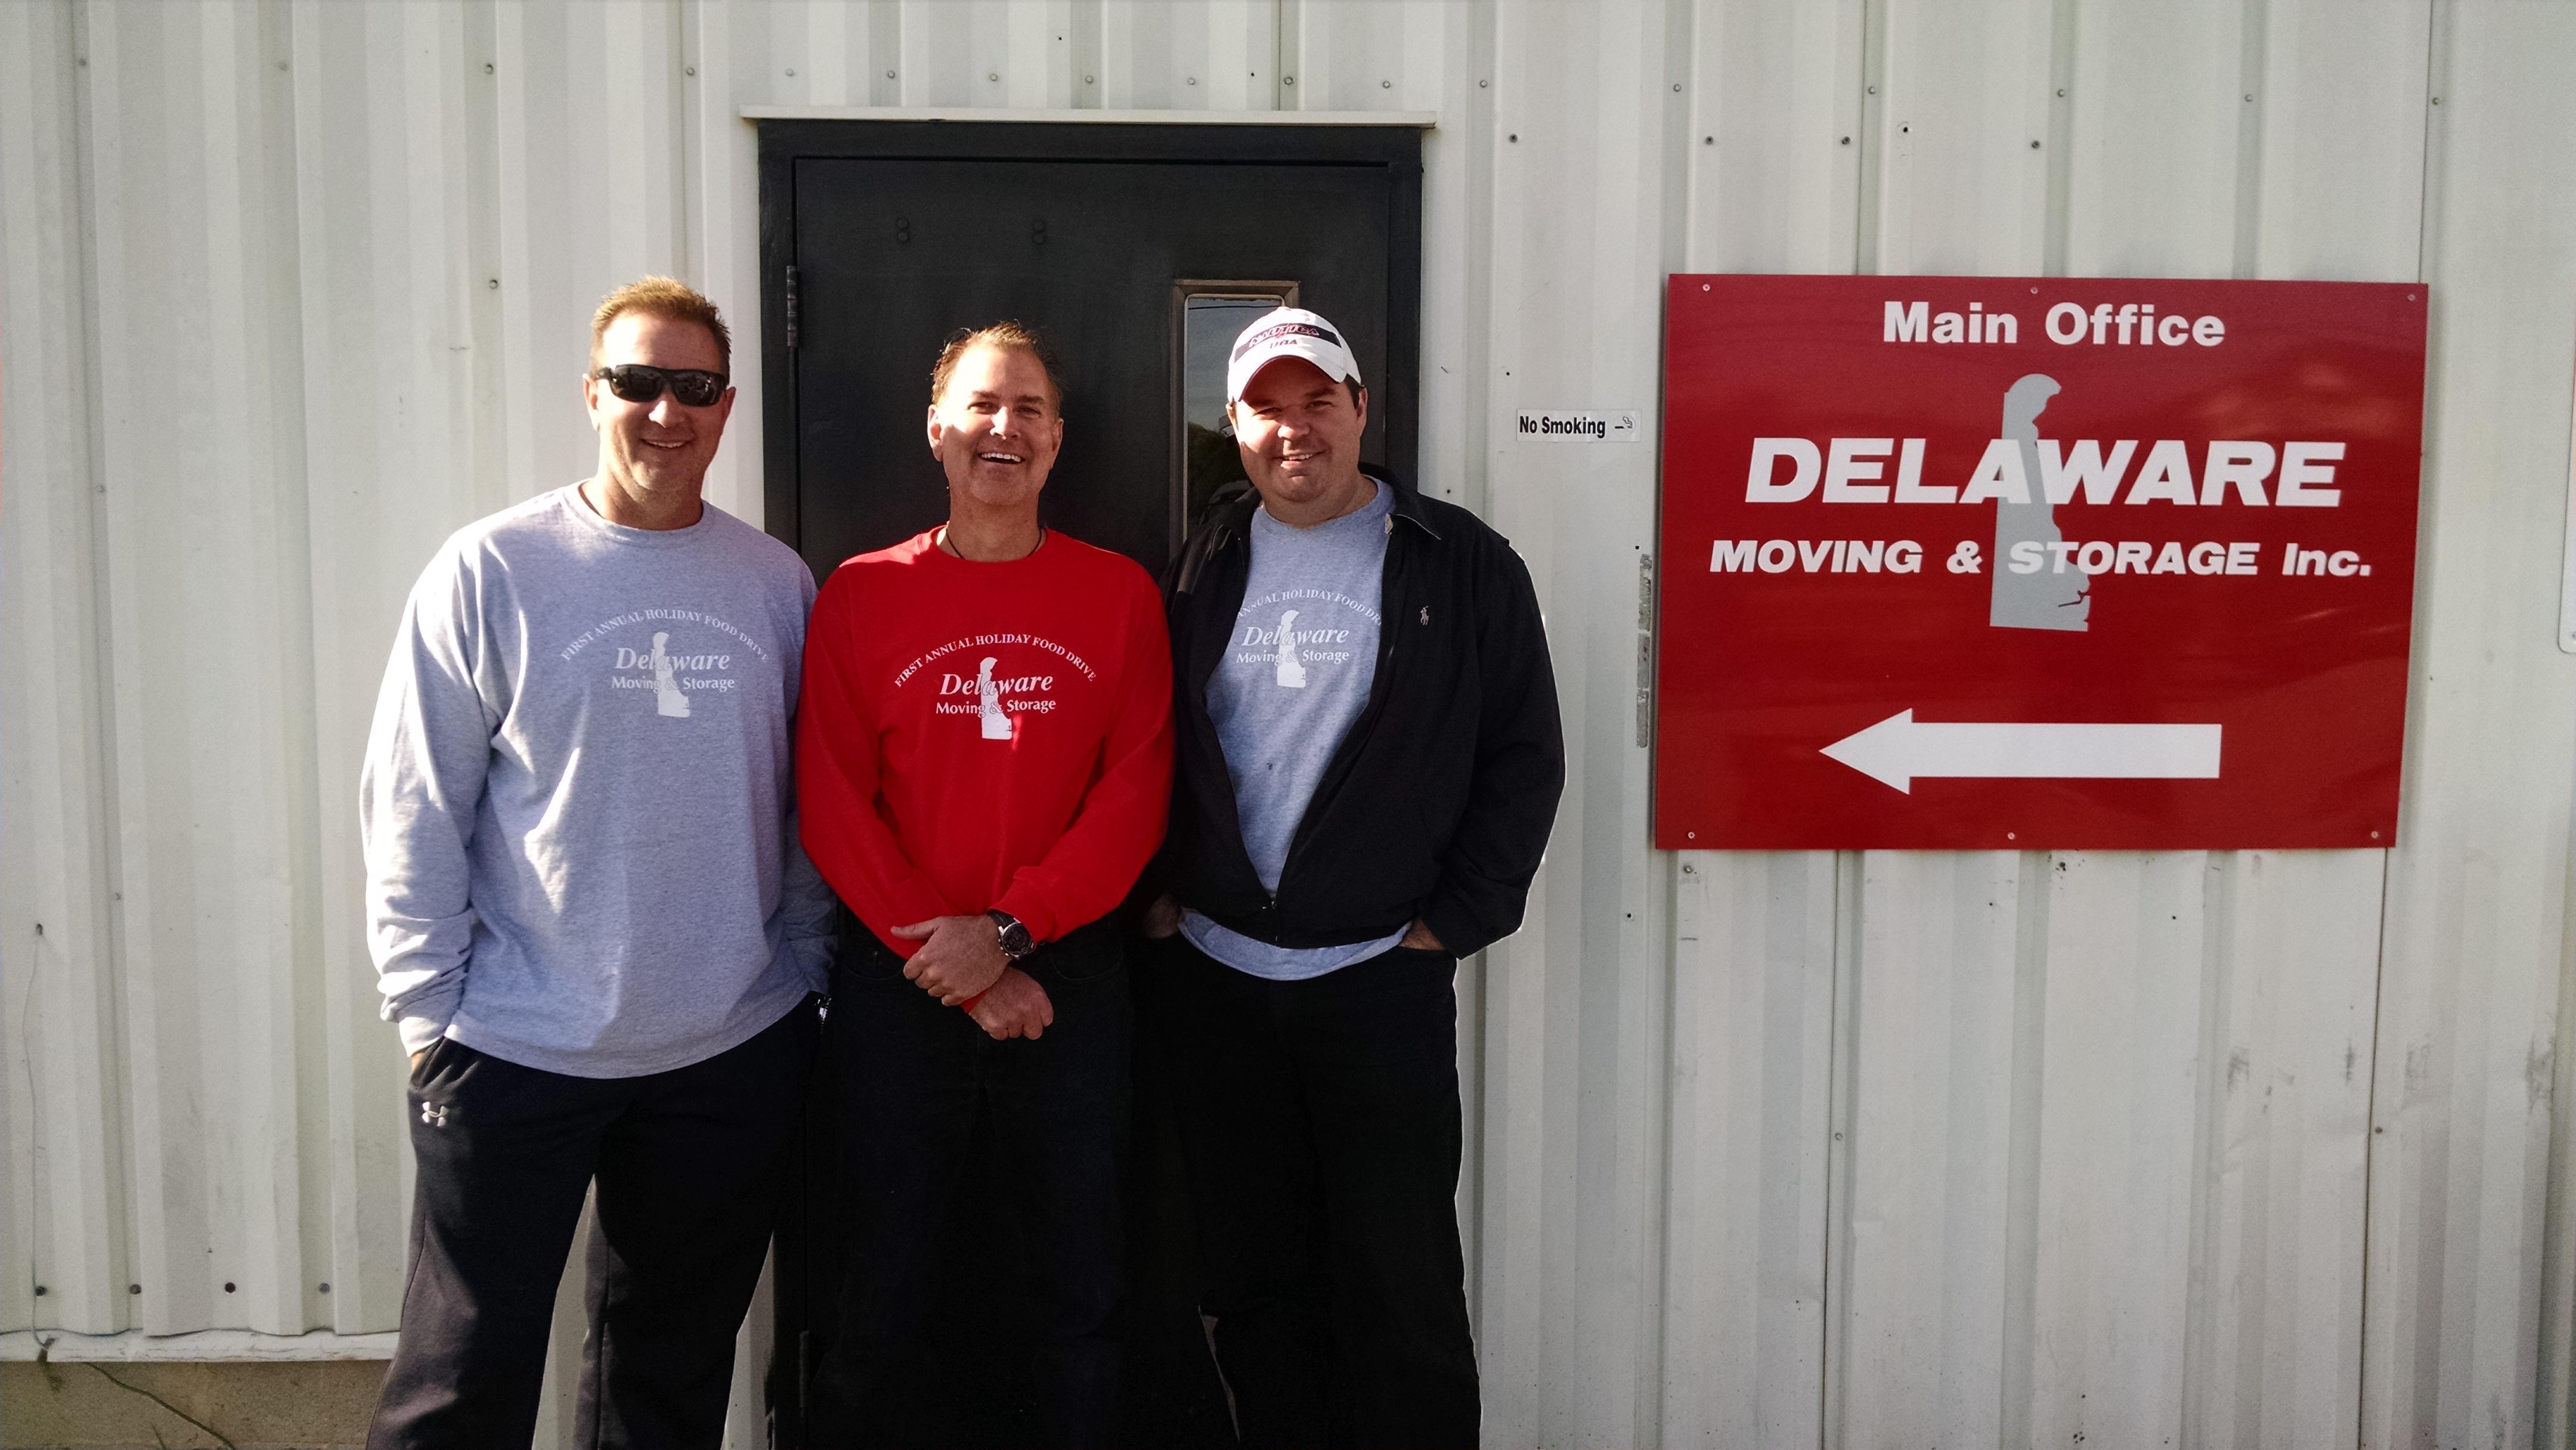 Delaware Moving & Storage